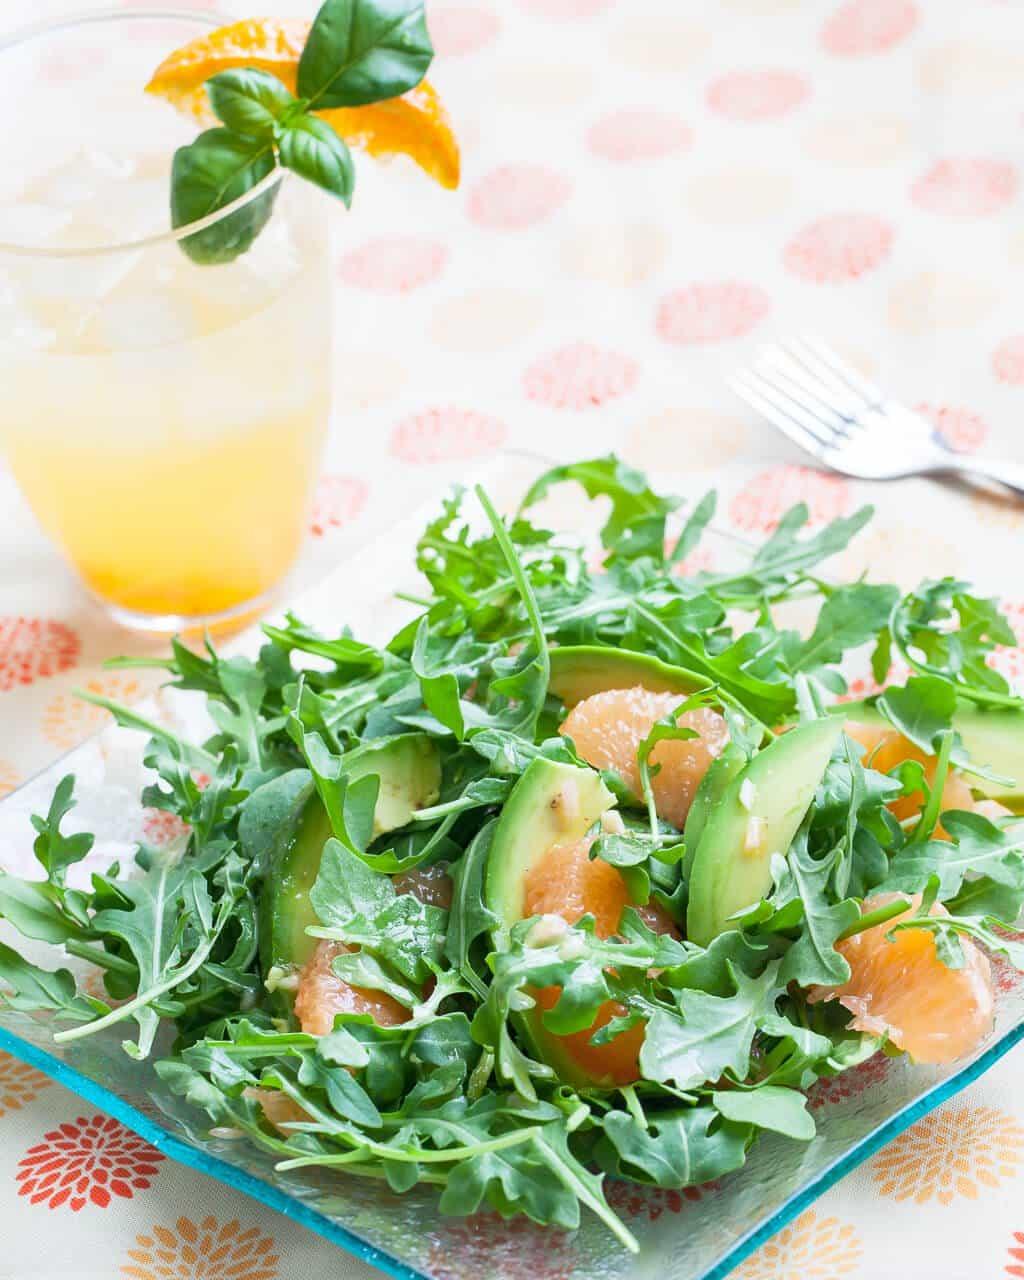 Grapefruit, Avocado & Baby Arugula Salad